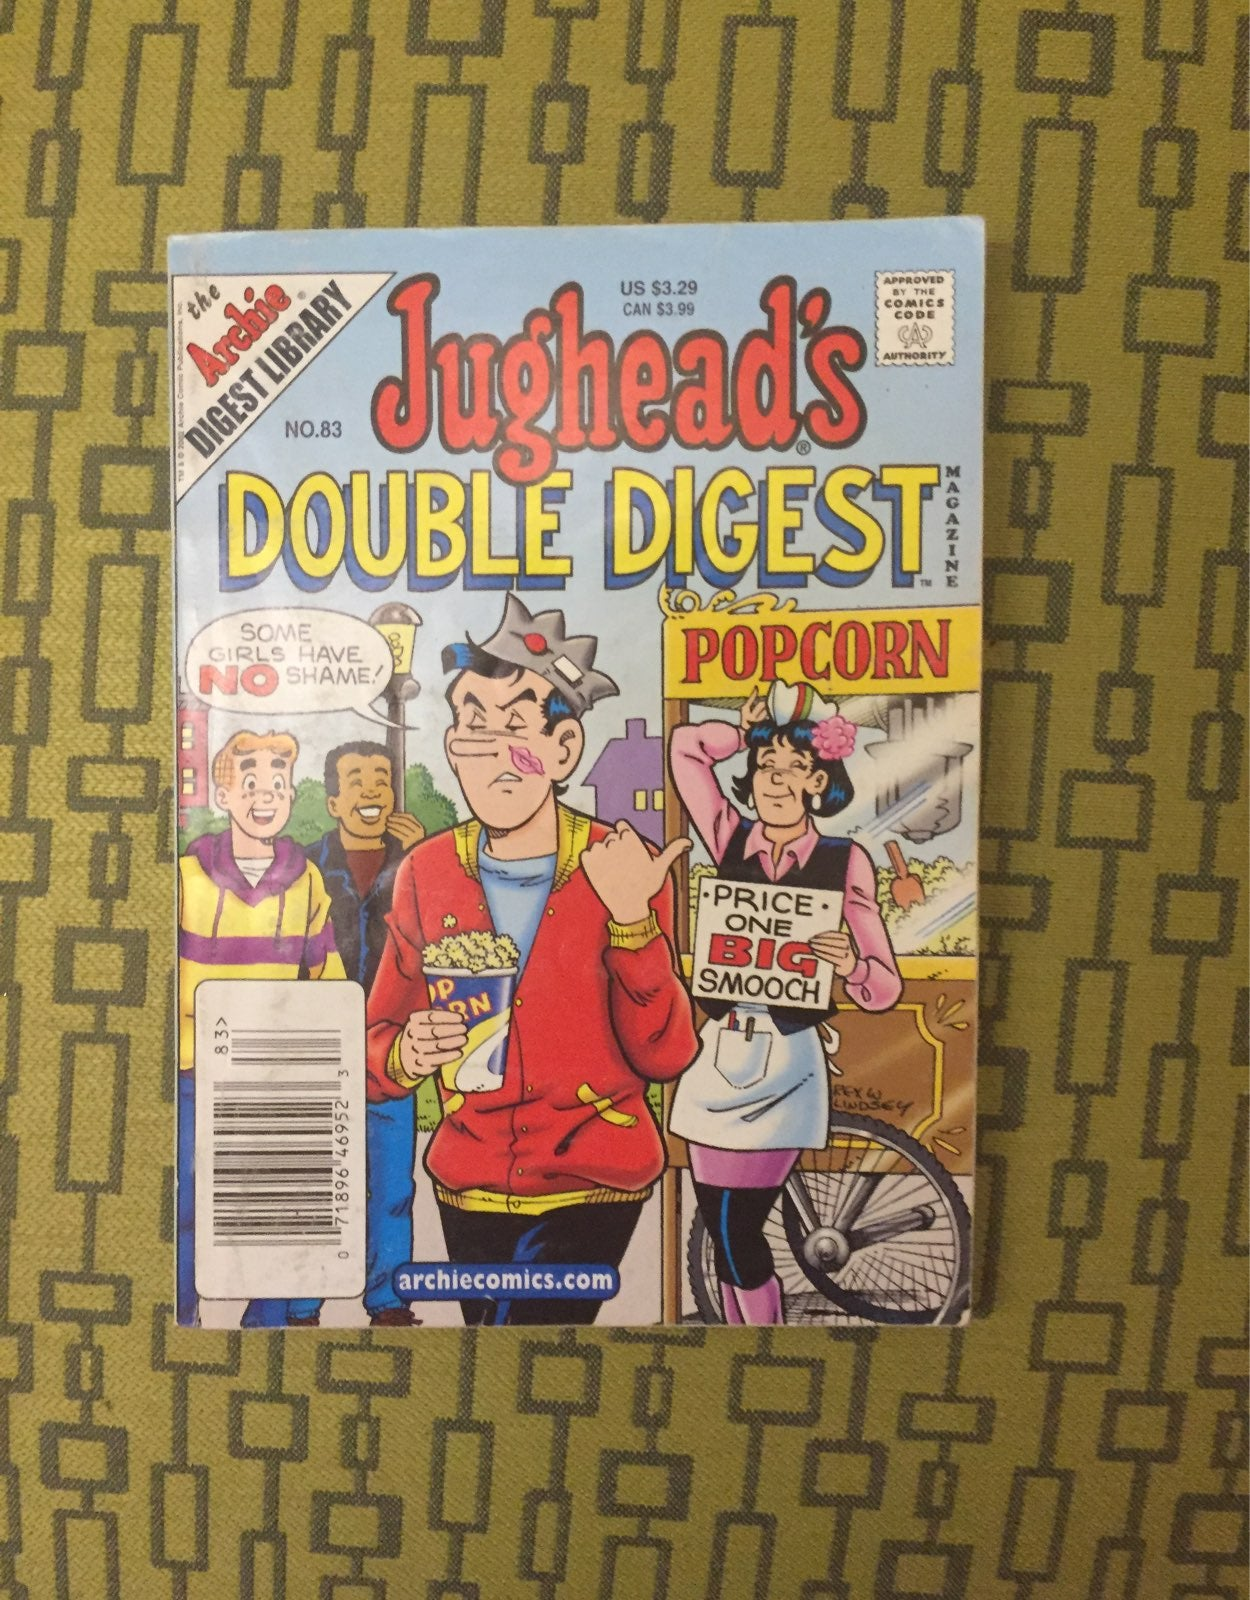 Jughead's double digest no. 83